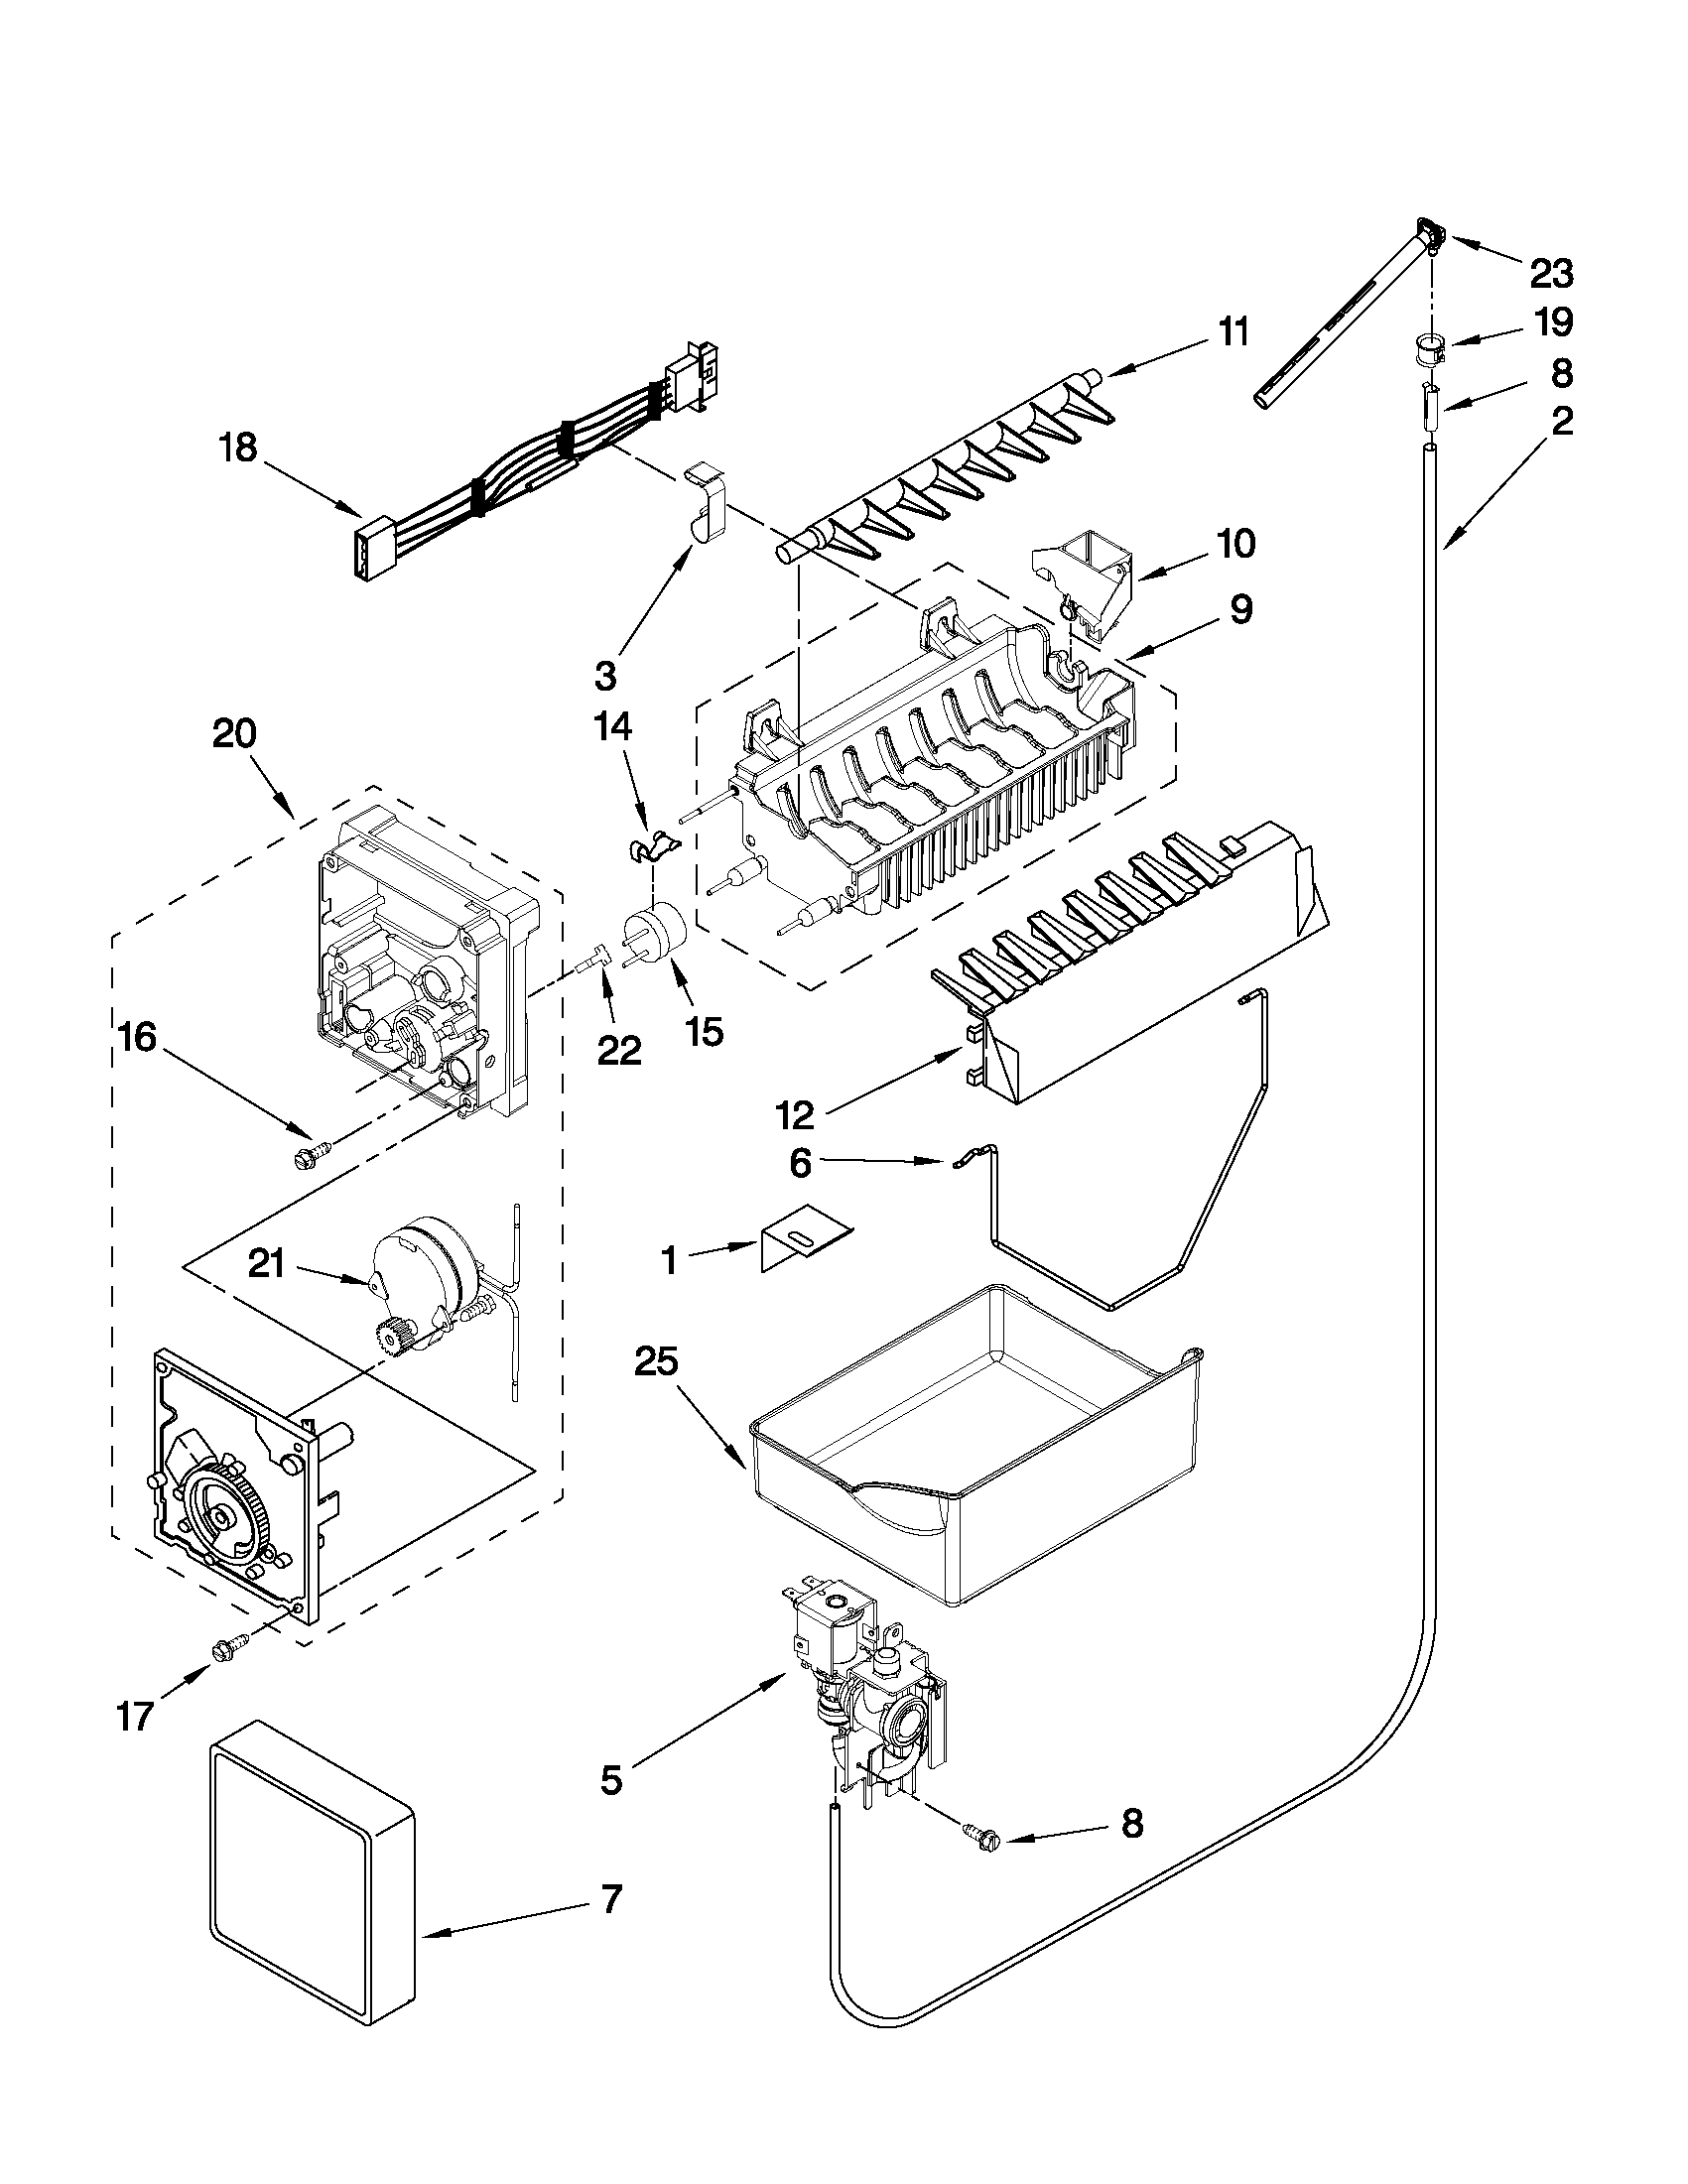 Maytag model MBF1958XEW4 bottom-mount refrigerator genuine